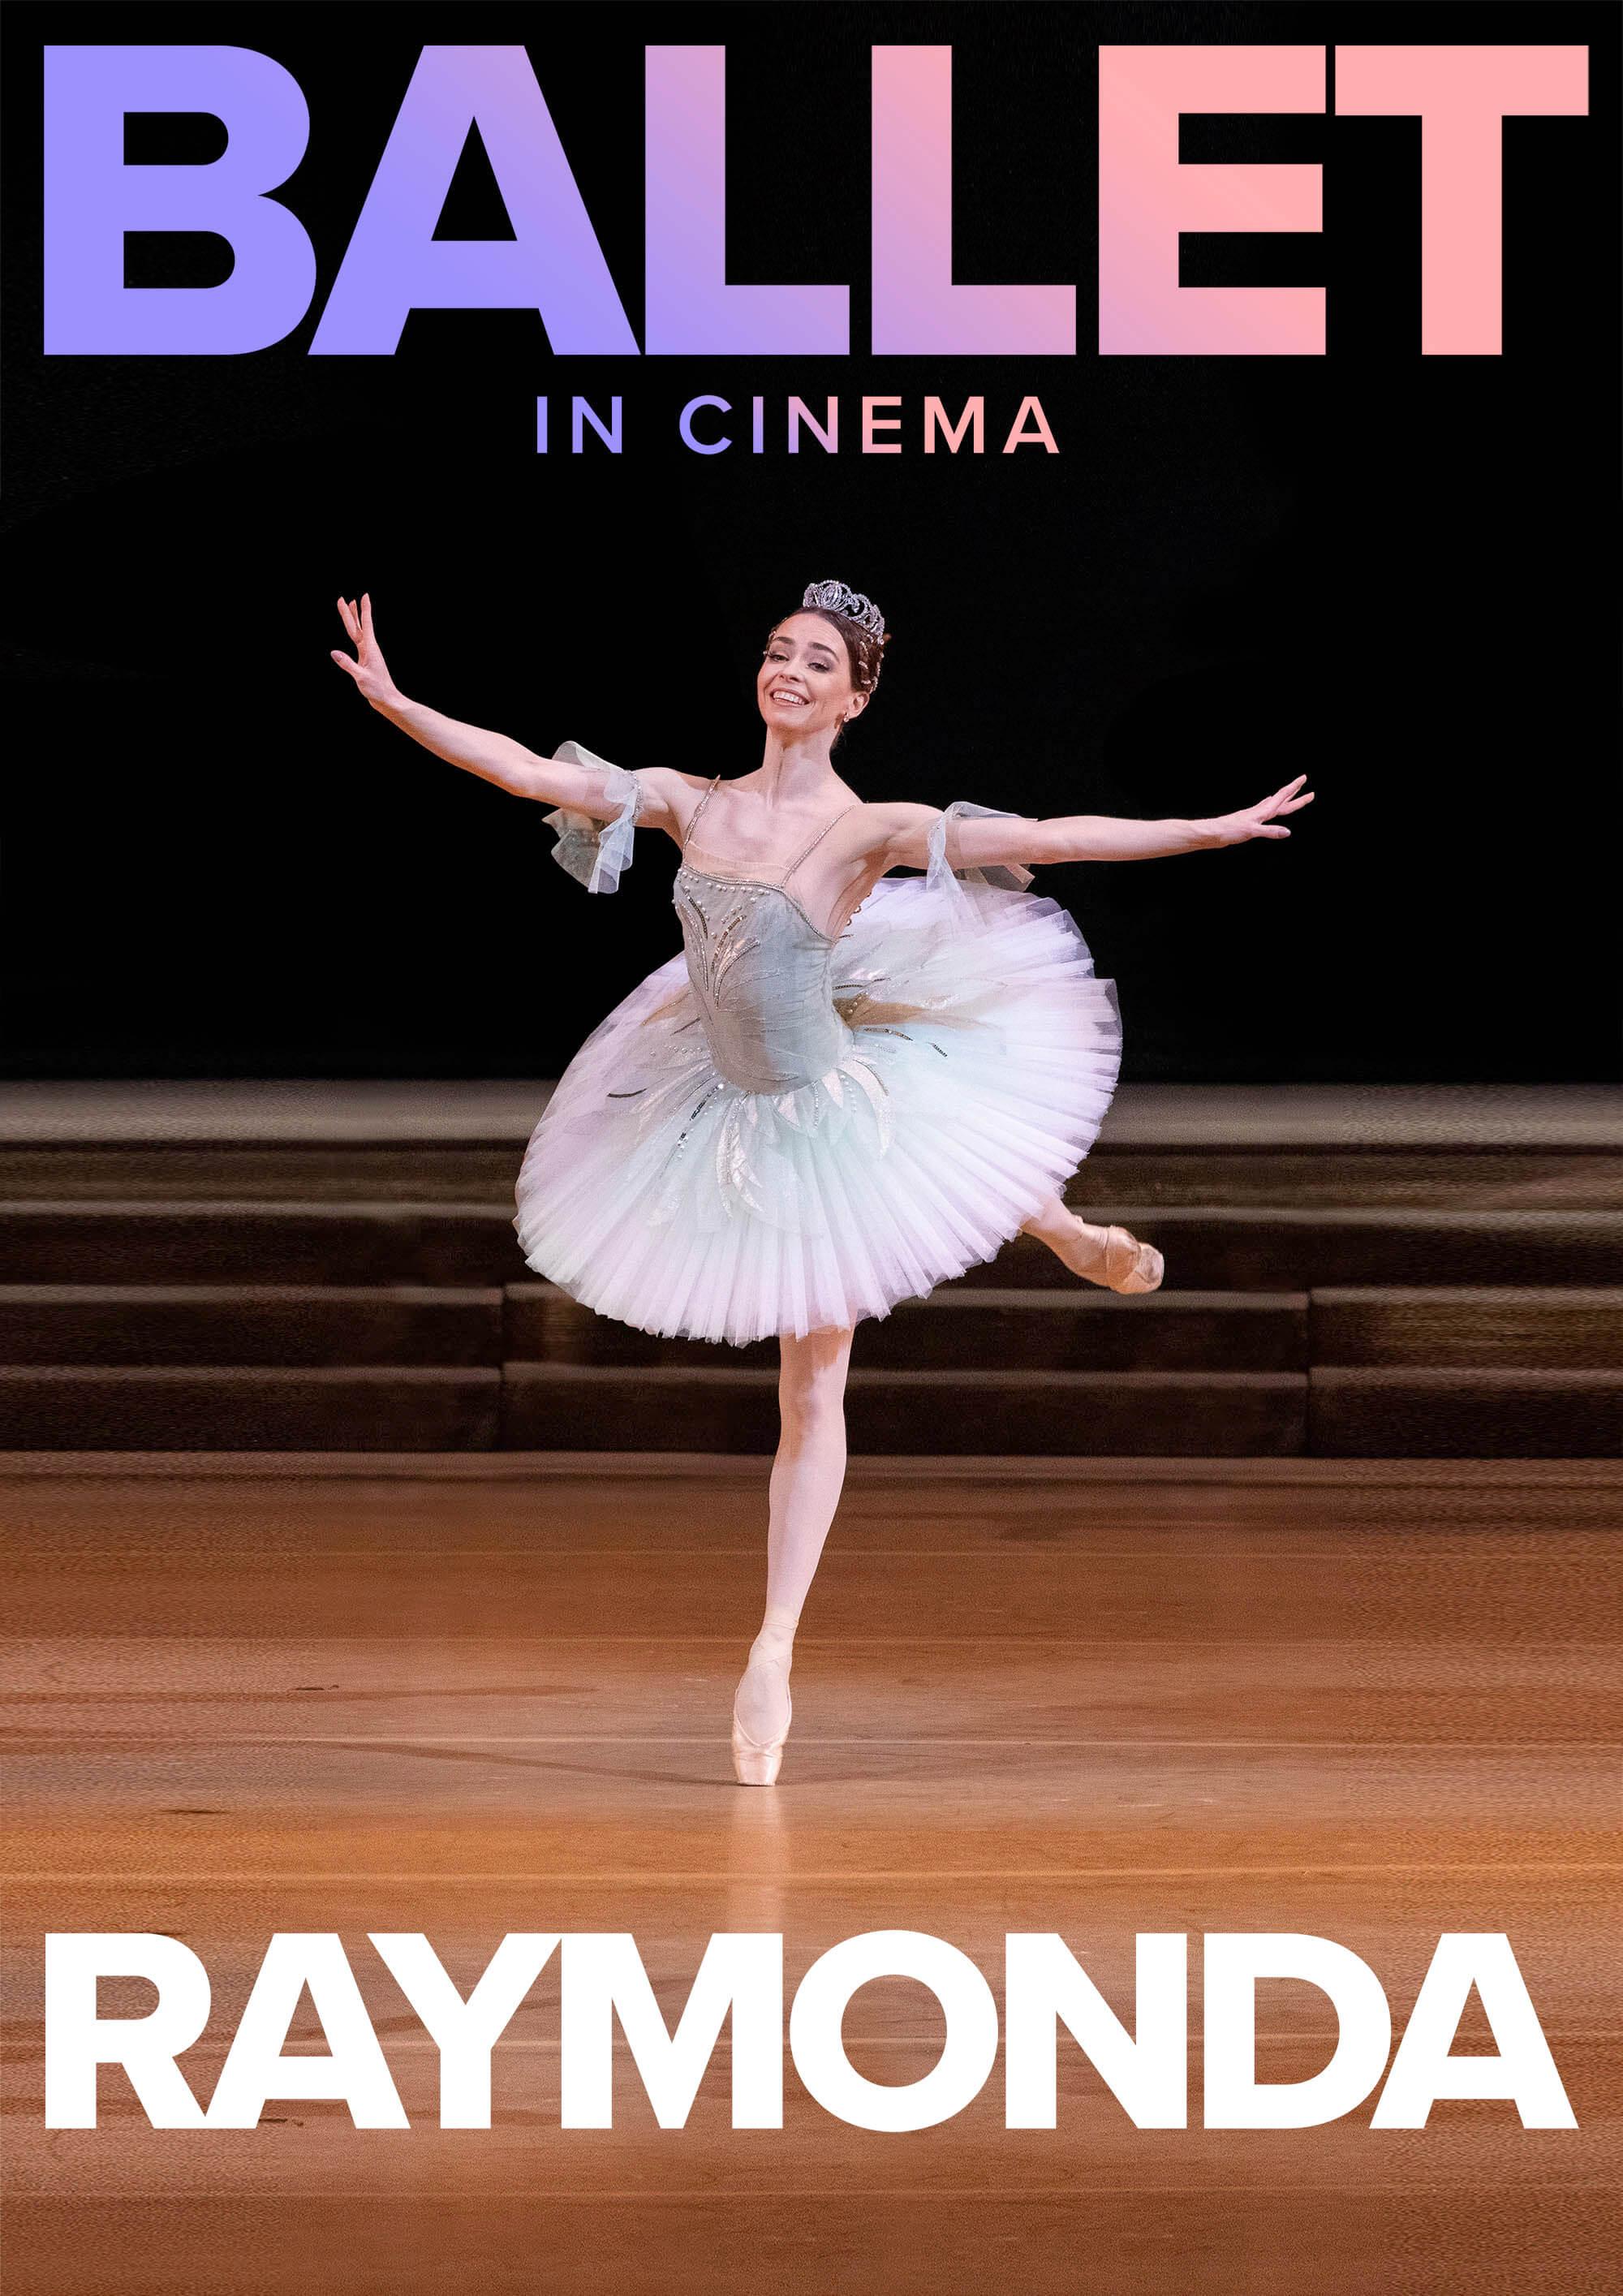 Bolshoi Ballet in Cinema: The Ballets | Pathe Live